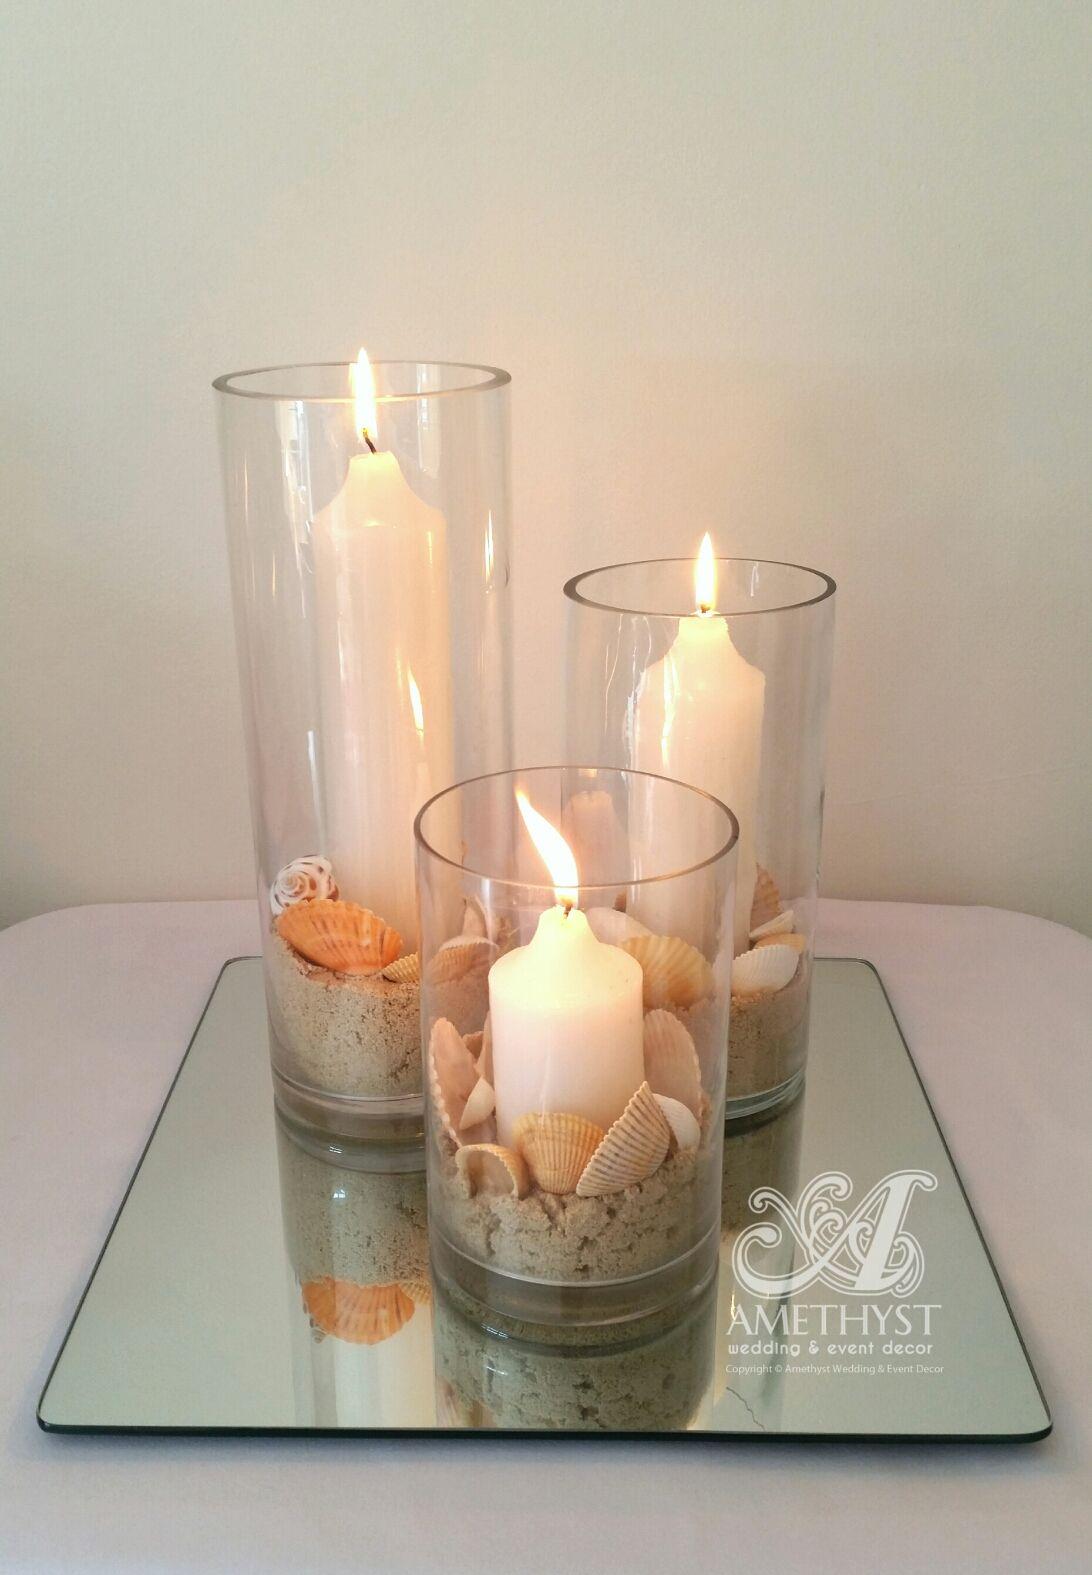 Elegant beach wedding centerpiece using cylinder vases